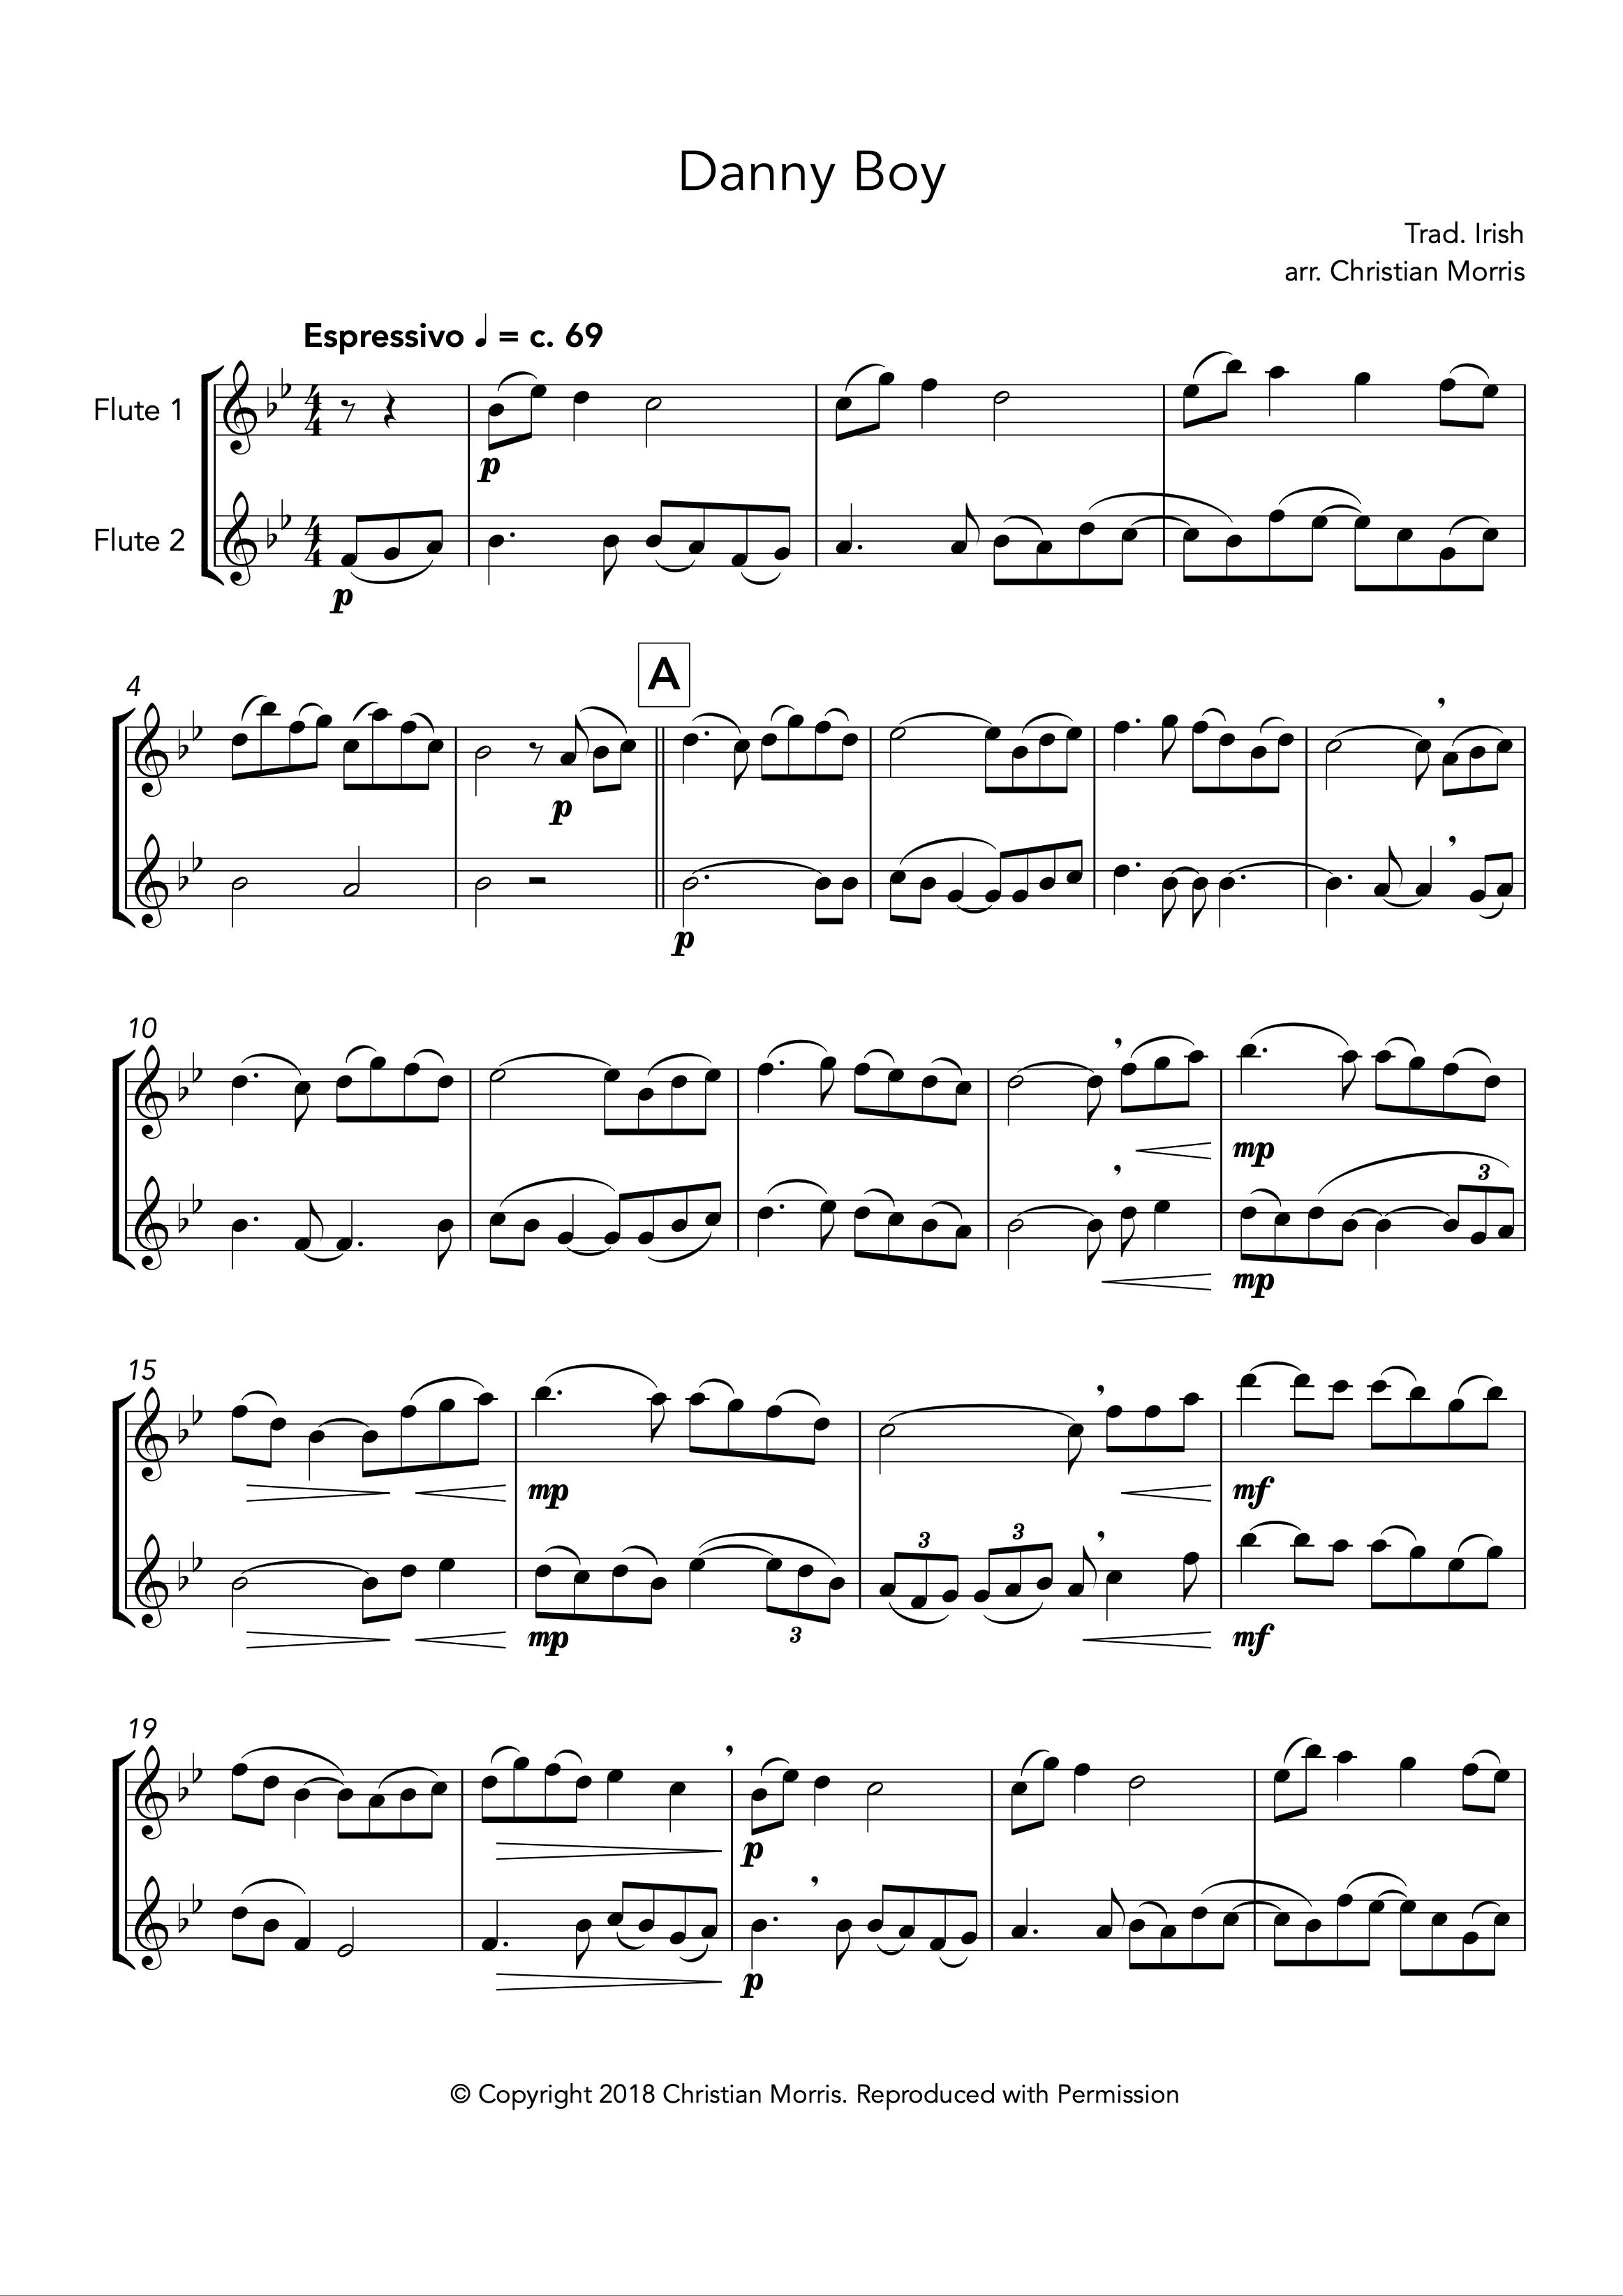 Danny Boy, fantasy for flute duet